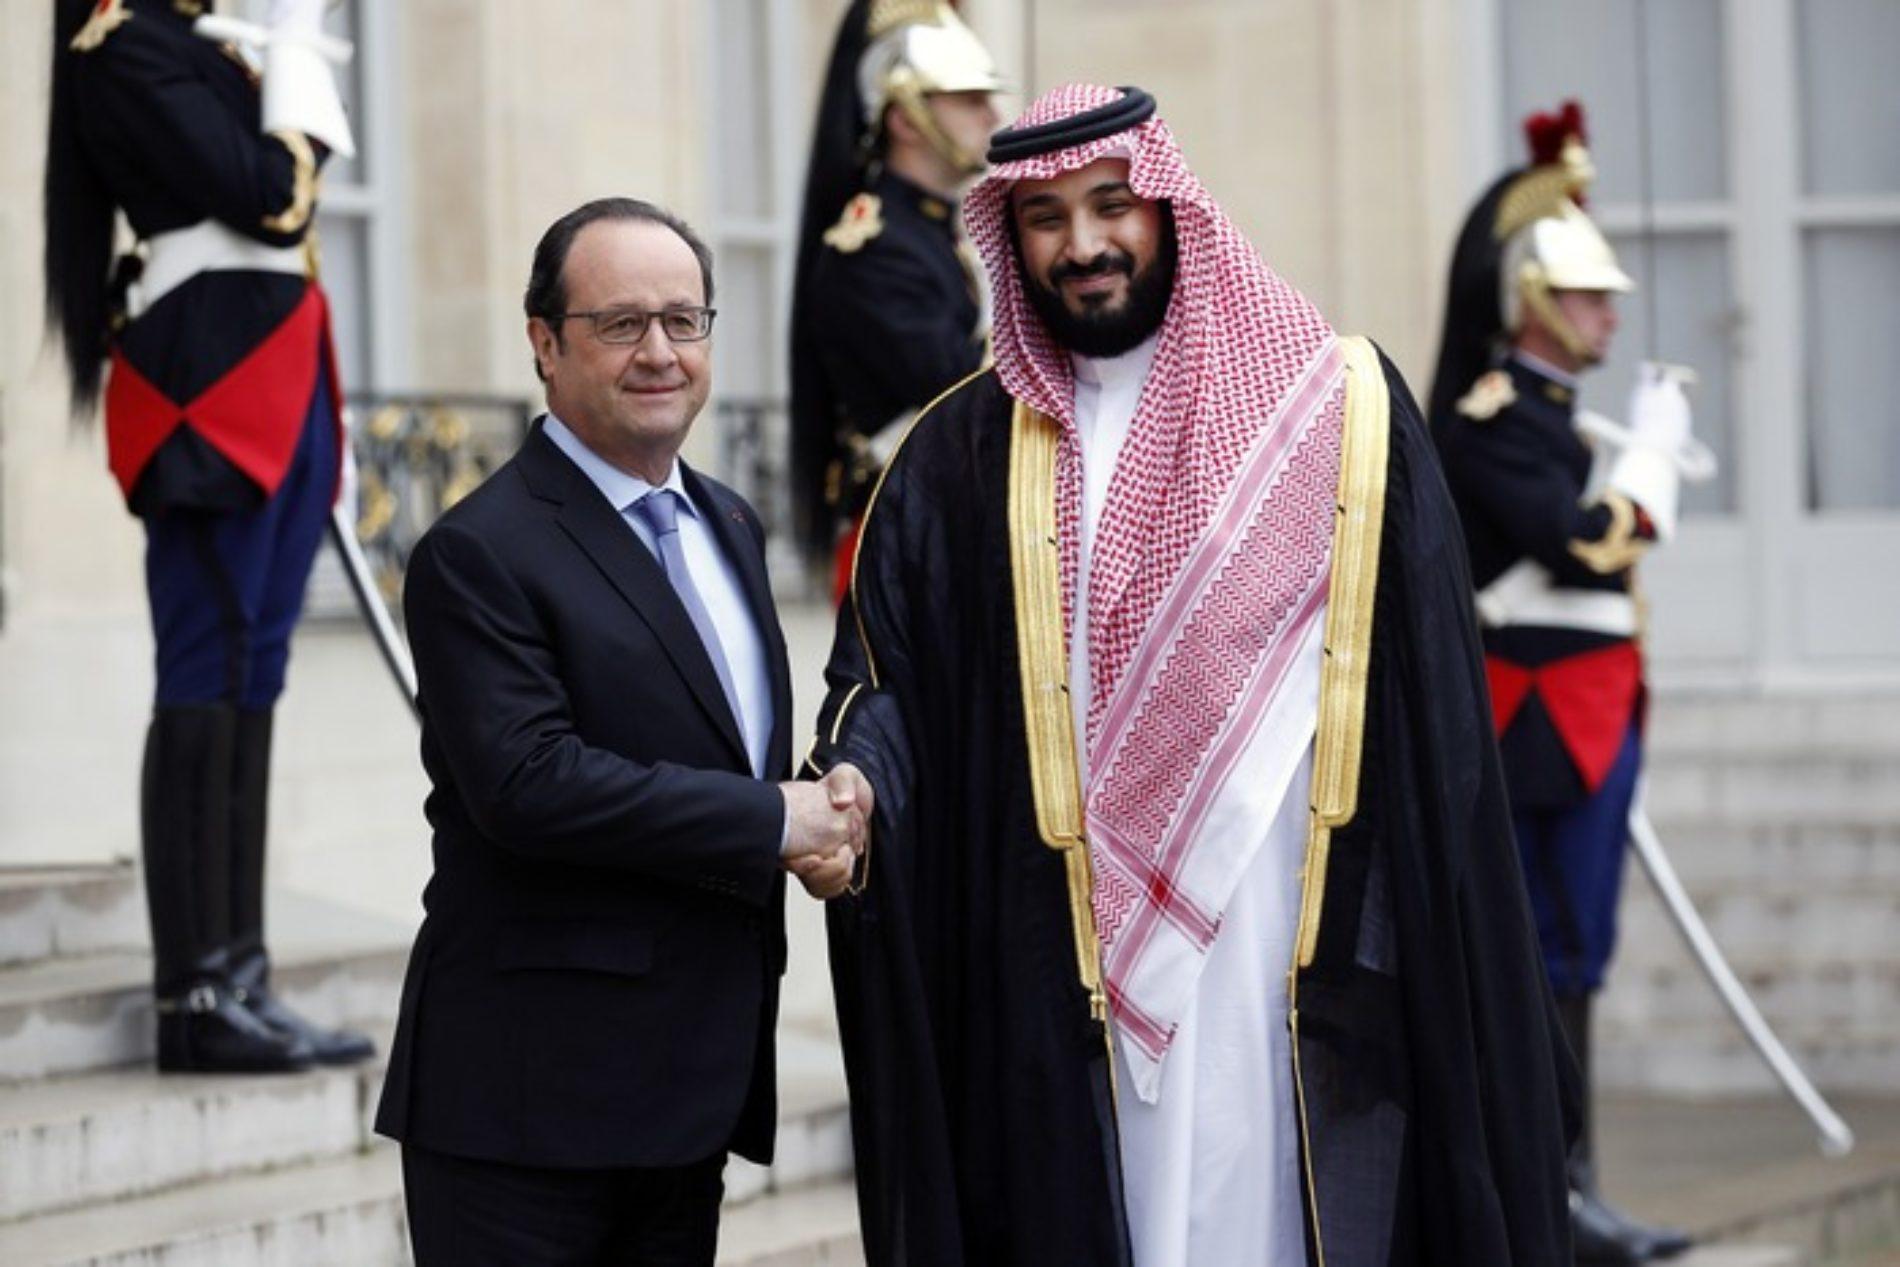 Saudi Arabia's Crown Prince Pledges Liberalization, Vows Return to 'Moderate' Islam